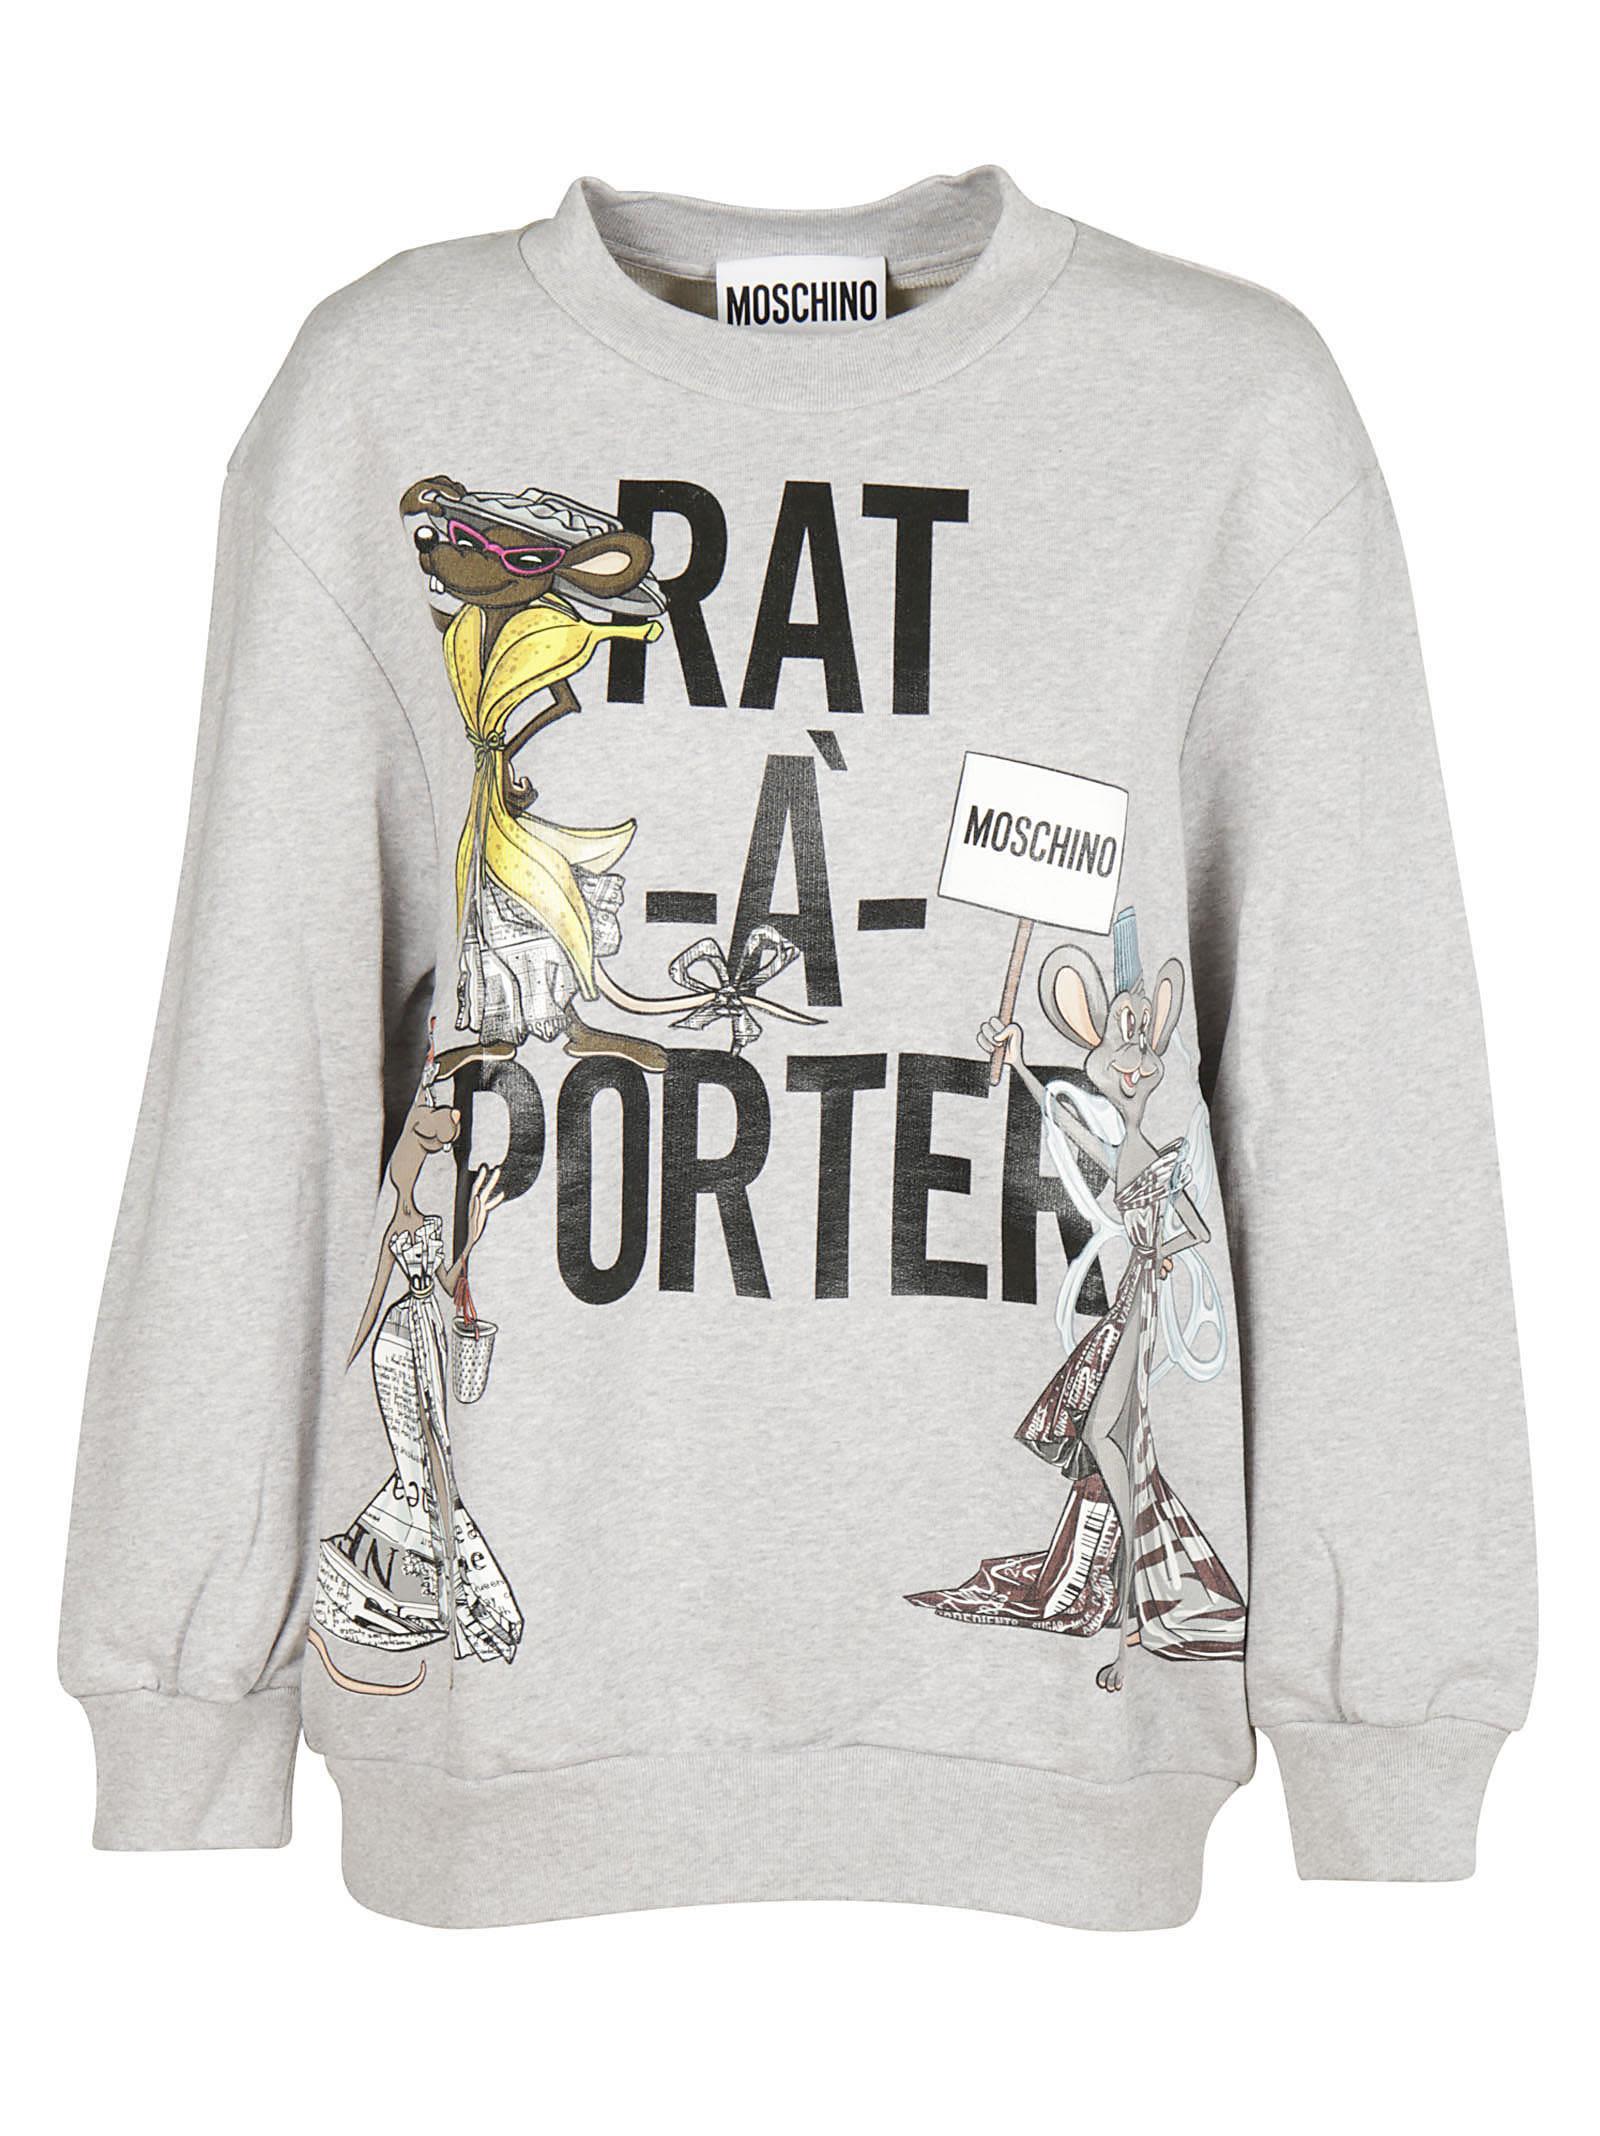 Moschino Rat-a-porter Sweatshirt